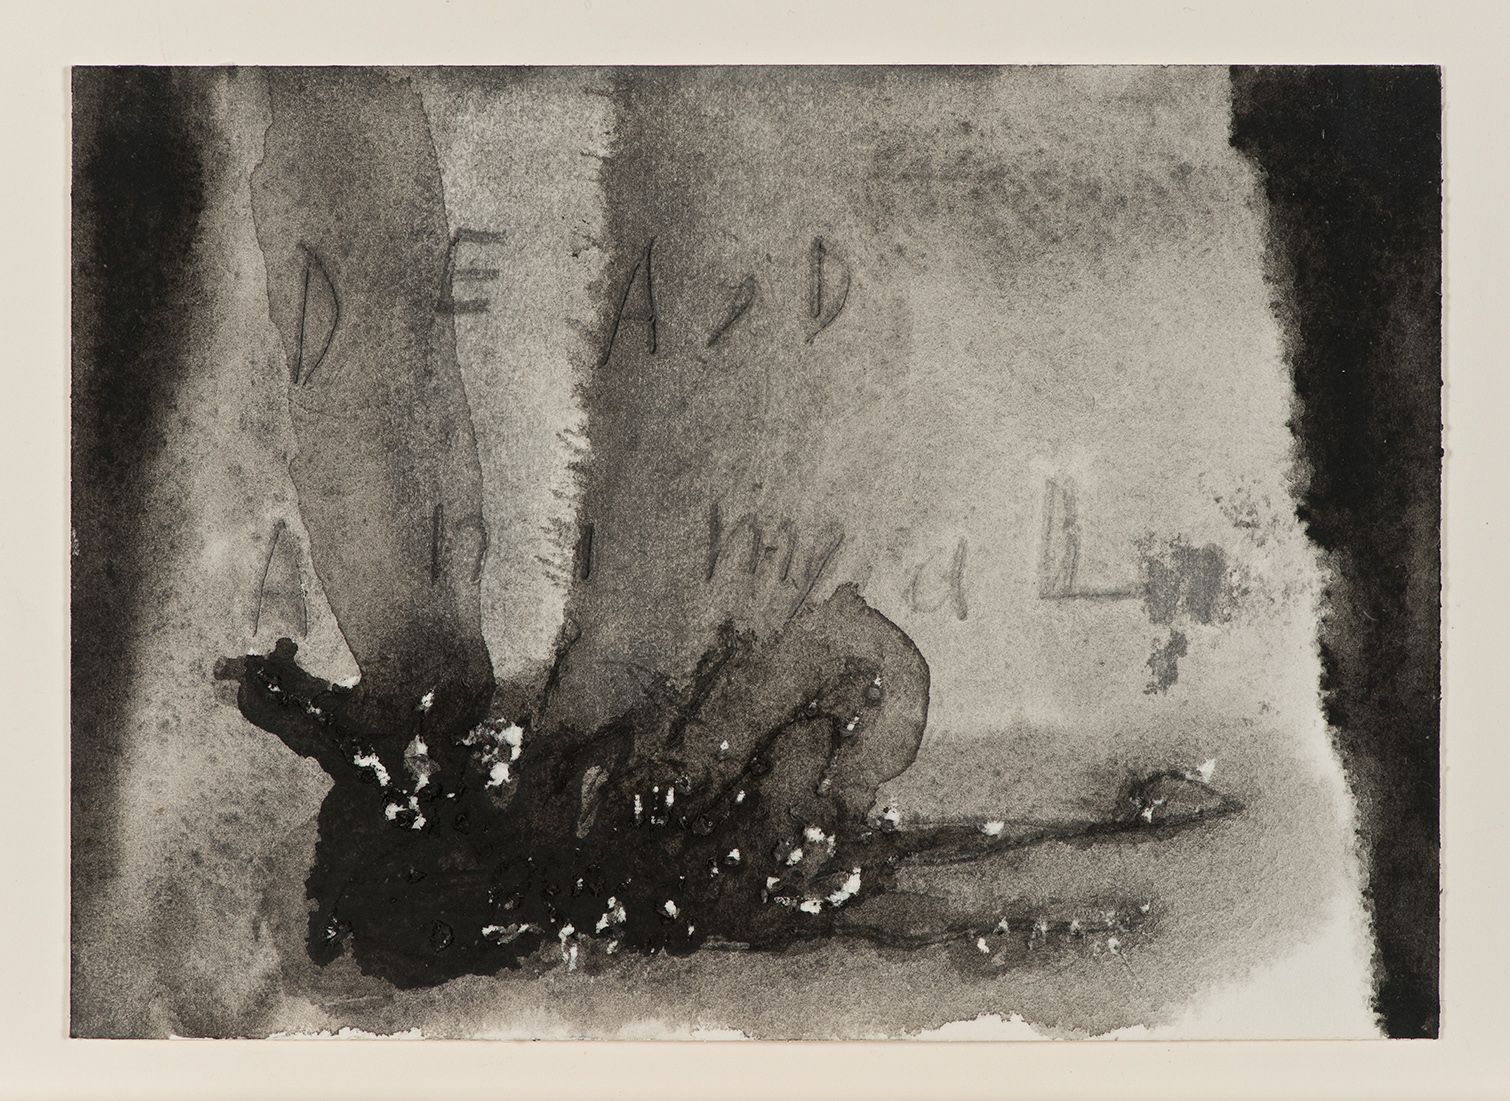 David Lynch, Dead Animal